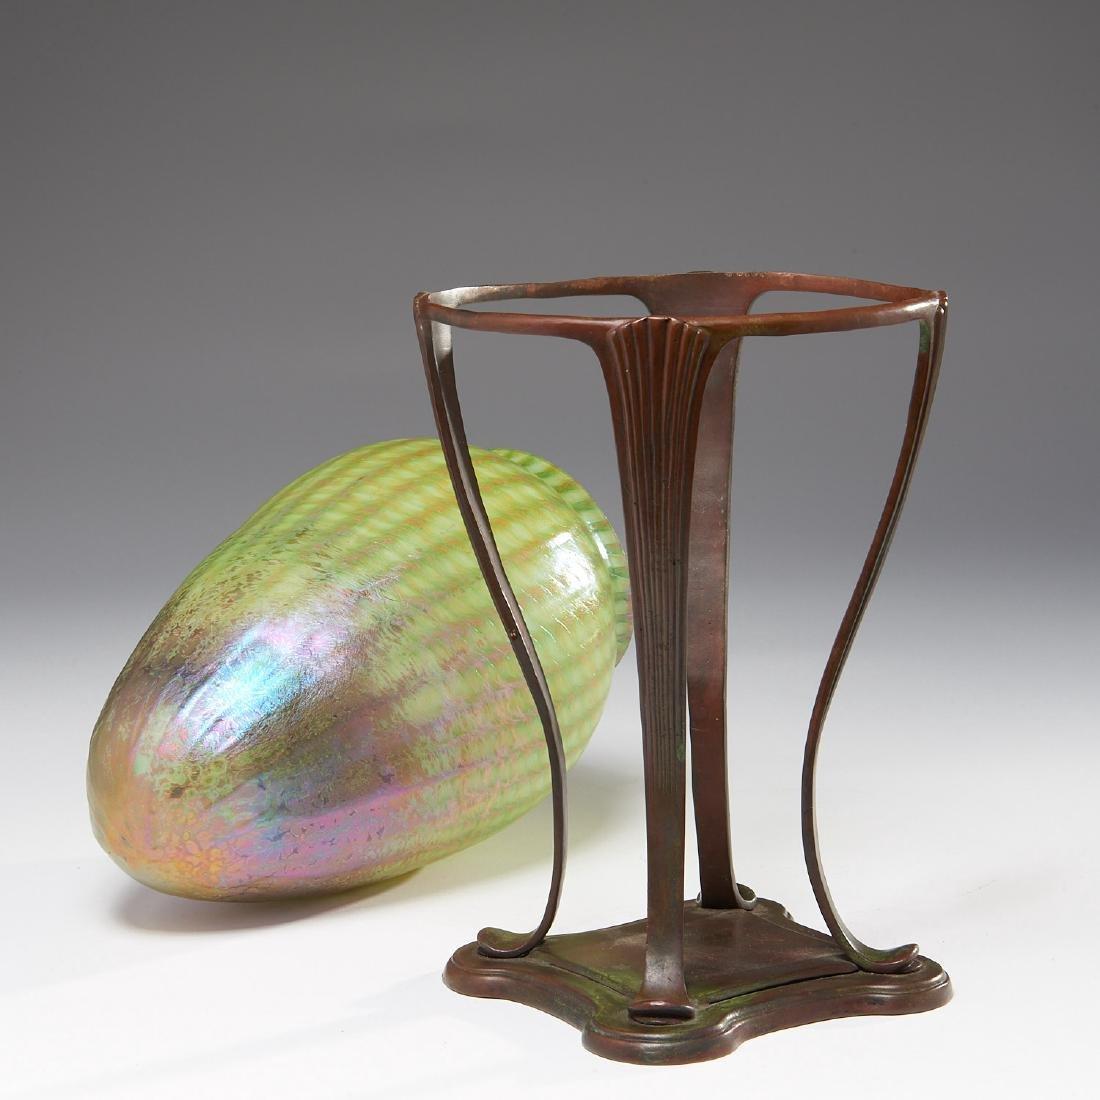 TIffany Studios Favrile glass vase on stand - 7